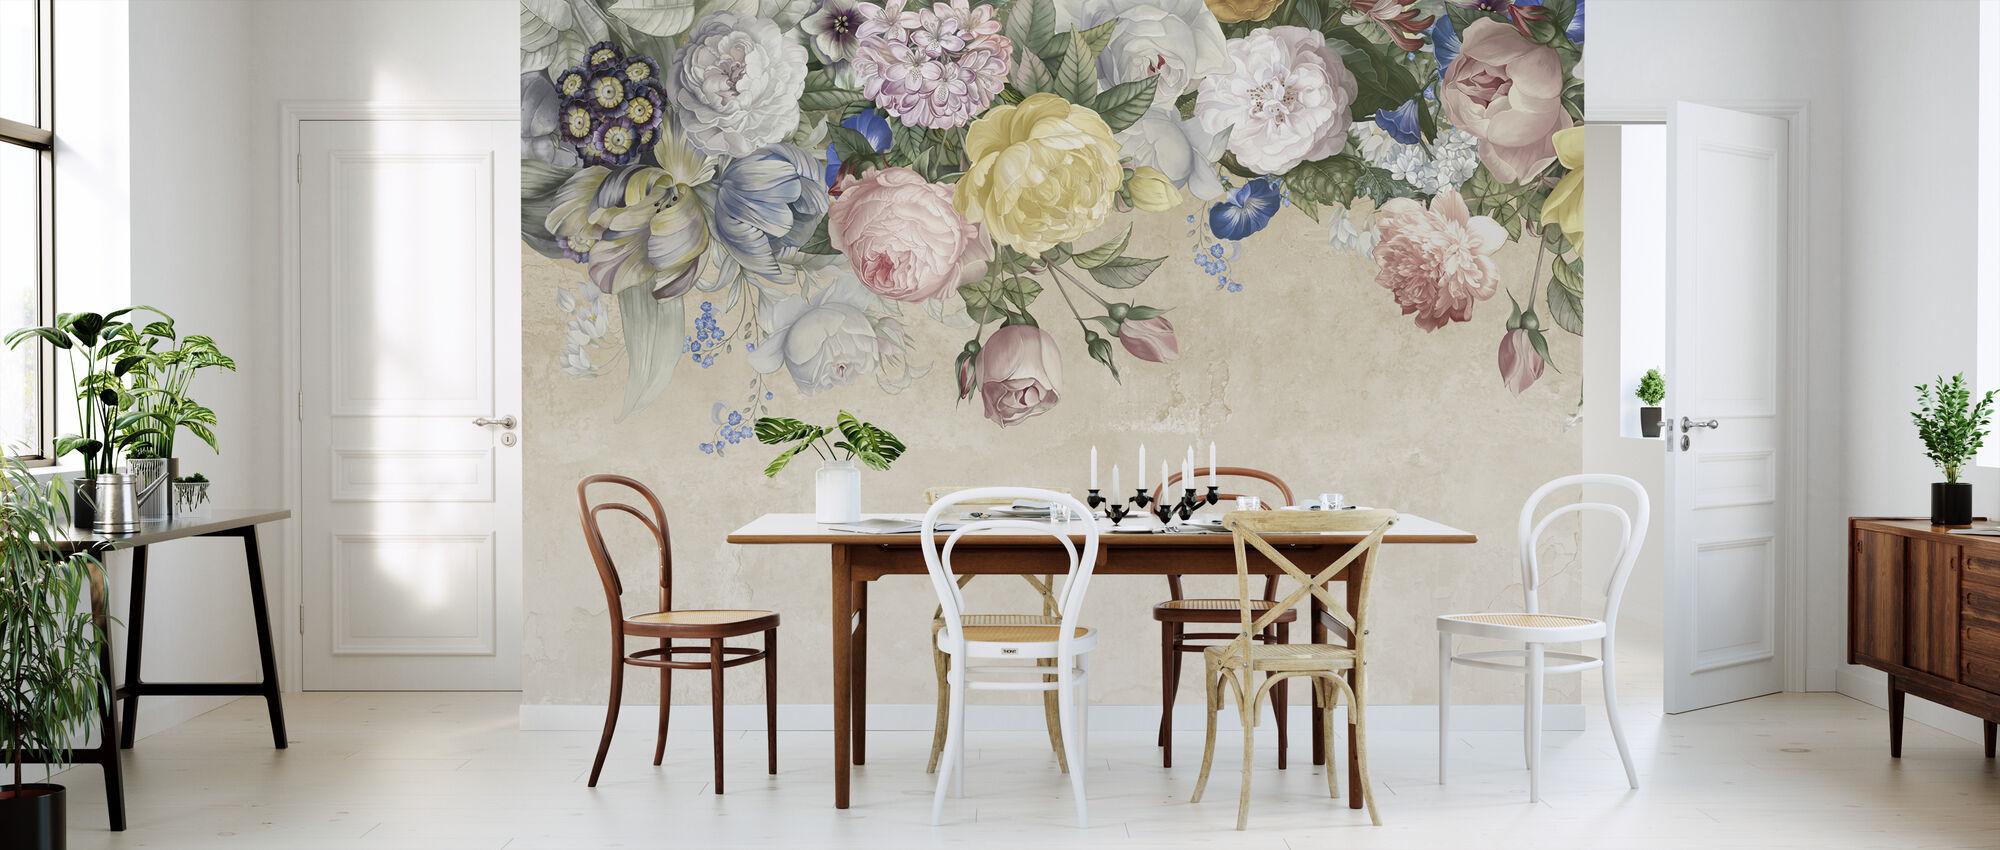 Wall of Flowers - Wallpaper - Kitchen